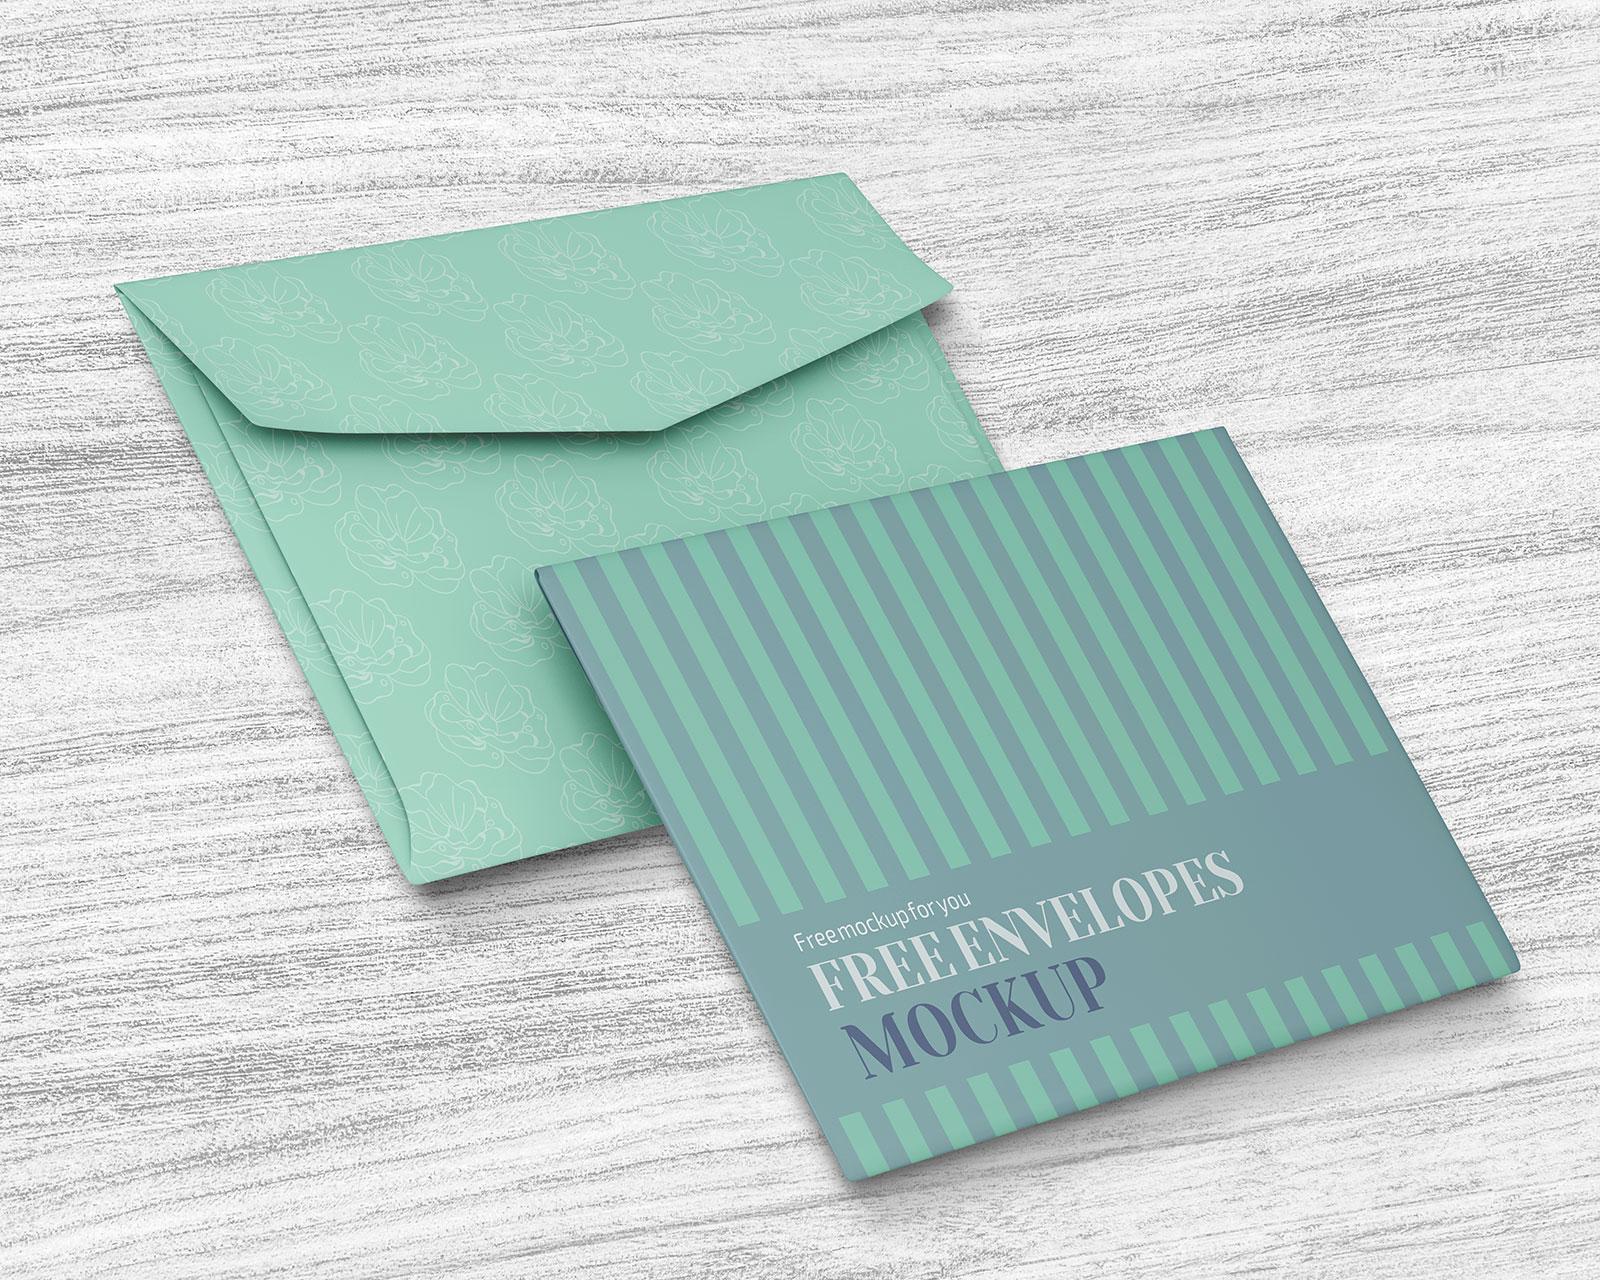 Free-Envelopes_Mockup-PSD-Set